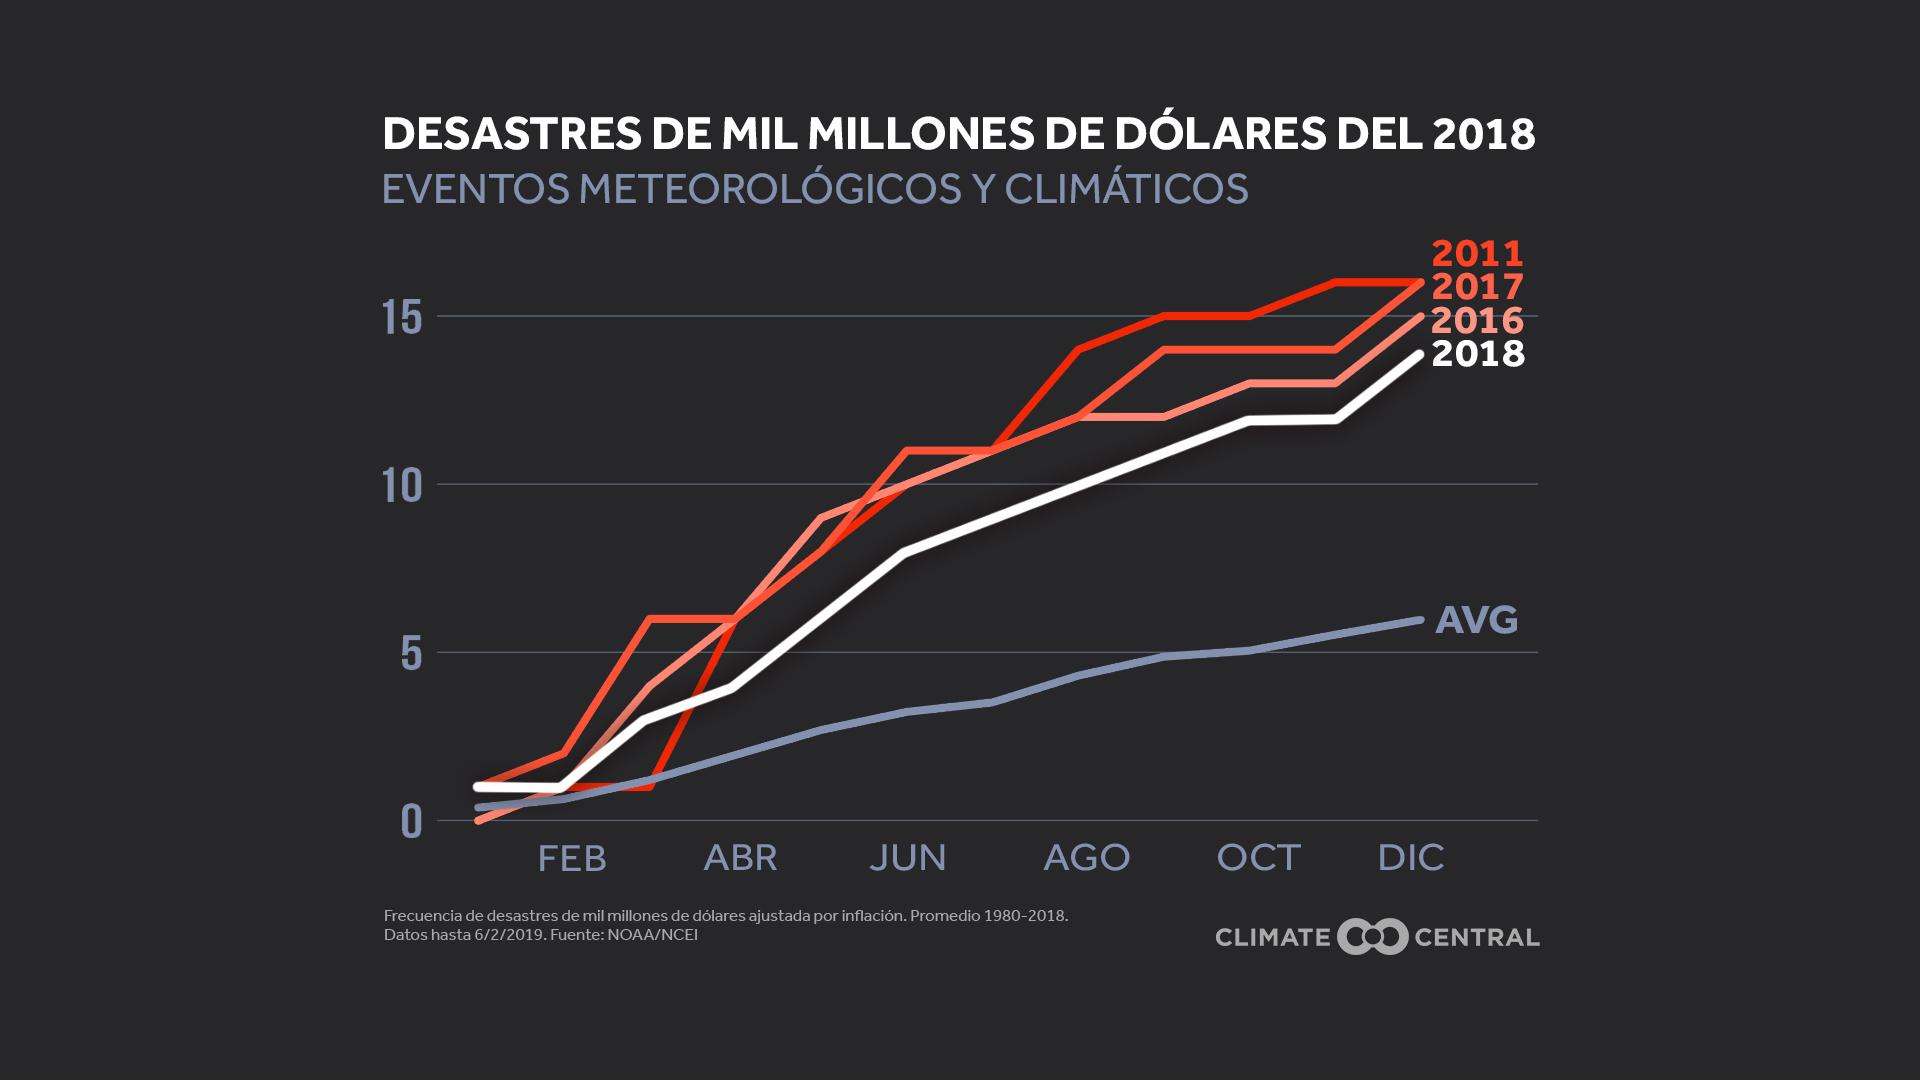 billion-dollar disasters - count